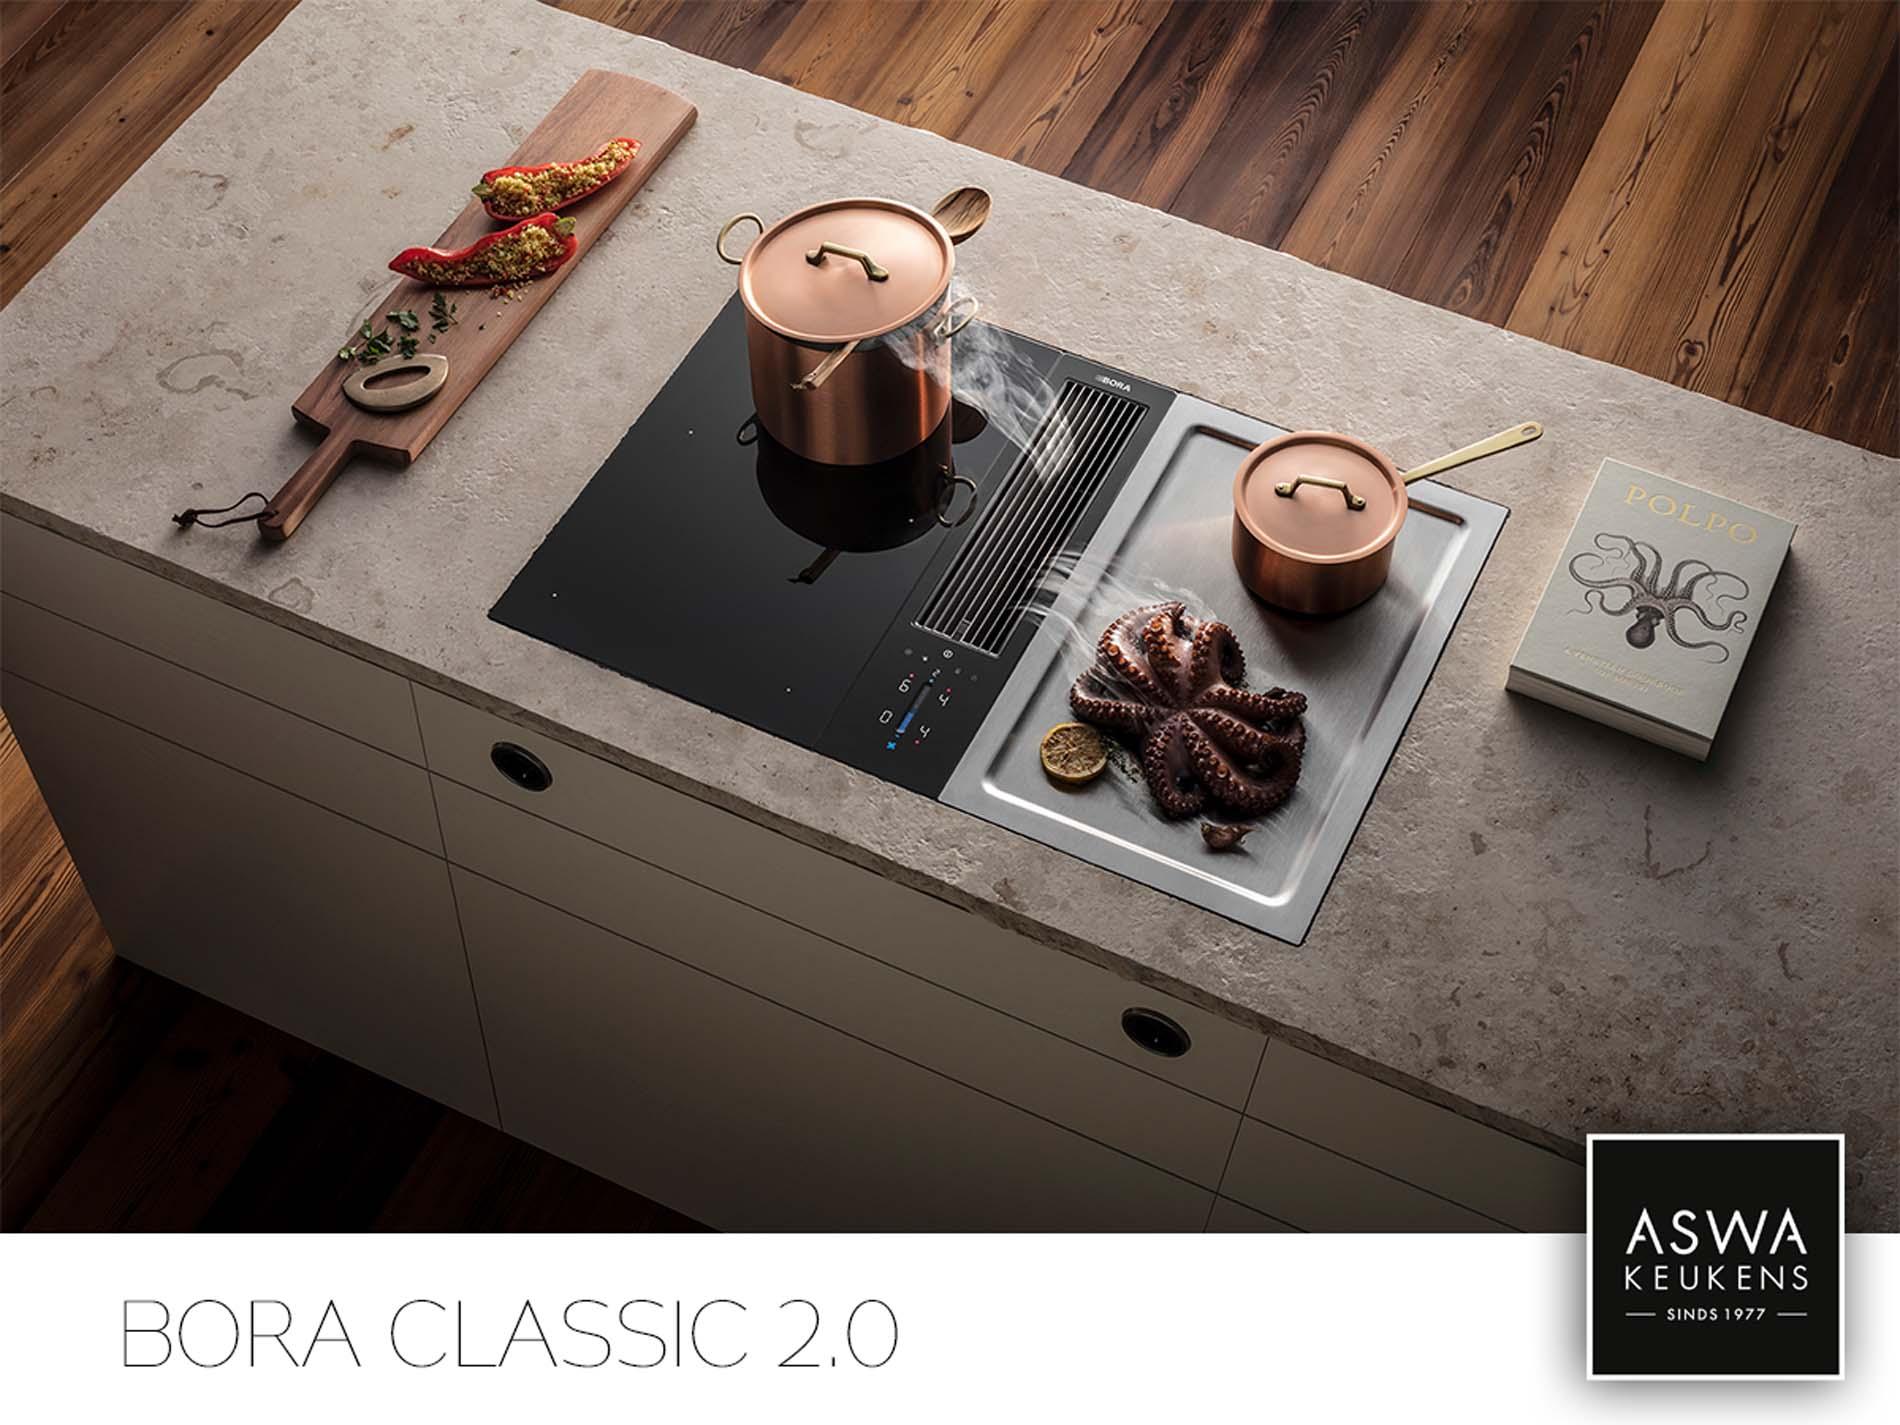 BORA Classic 2.0, BORA Kookplaat met afzuiging, ASWA Keukens